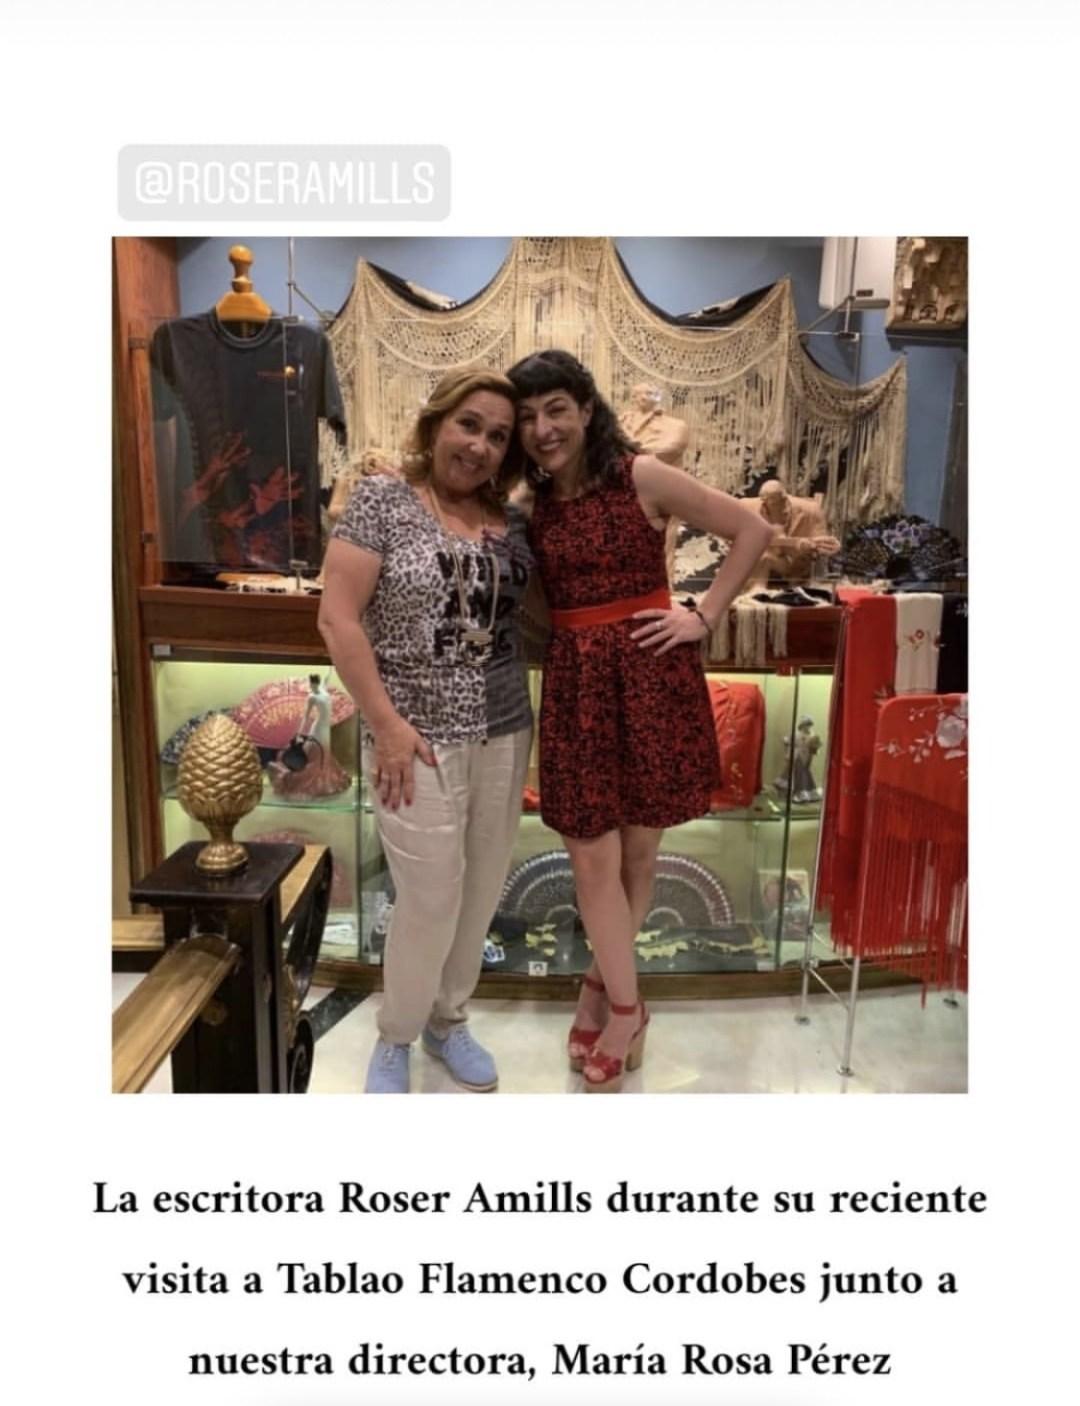 Roser Amills tablao flamenco cordobes barcelona